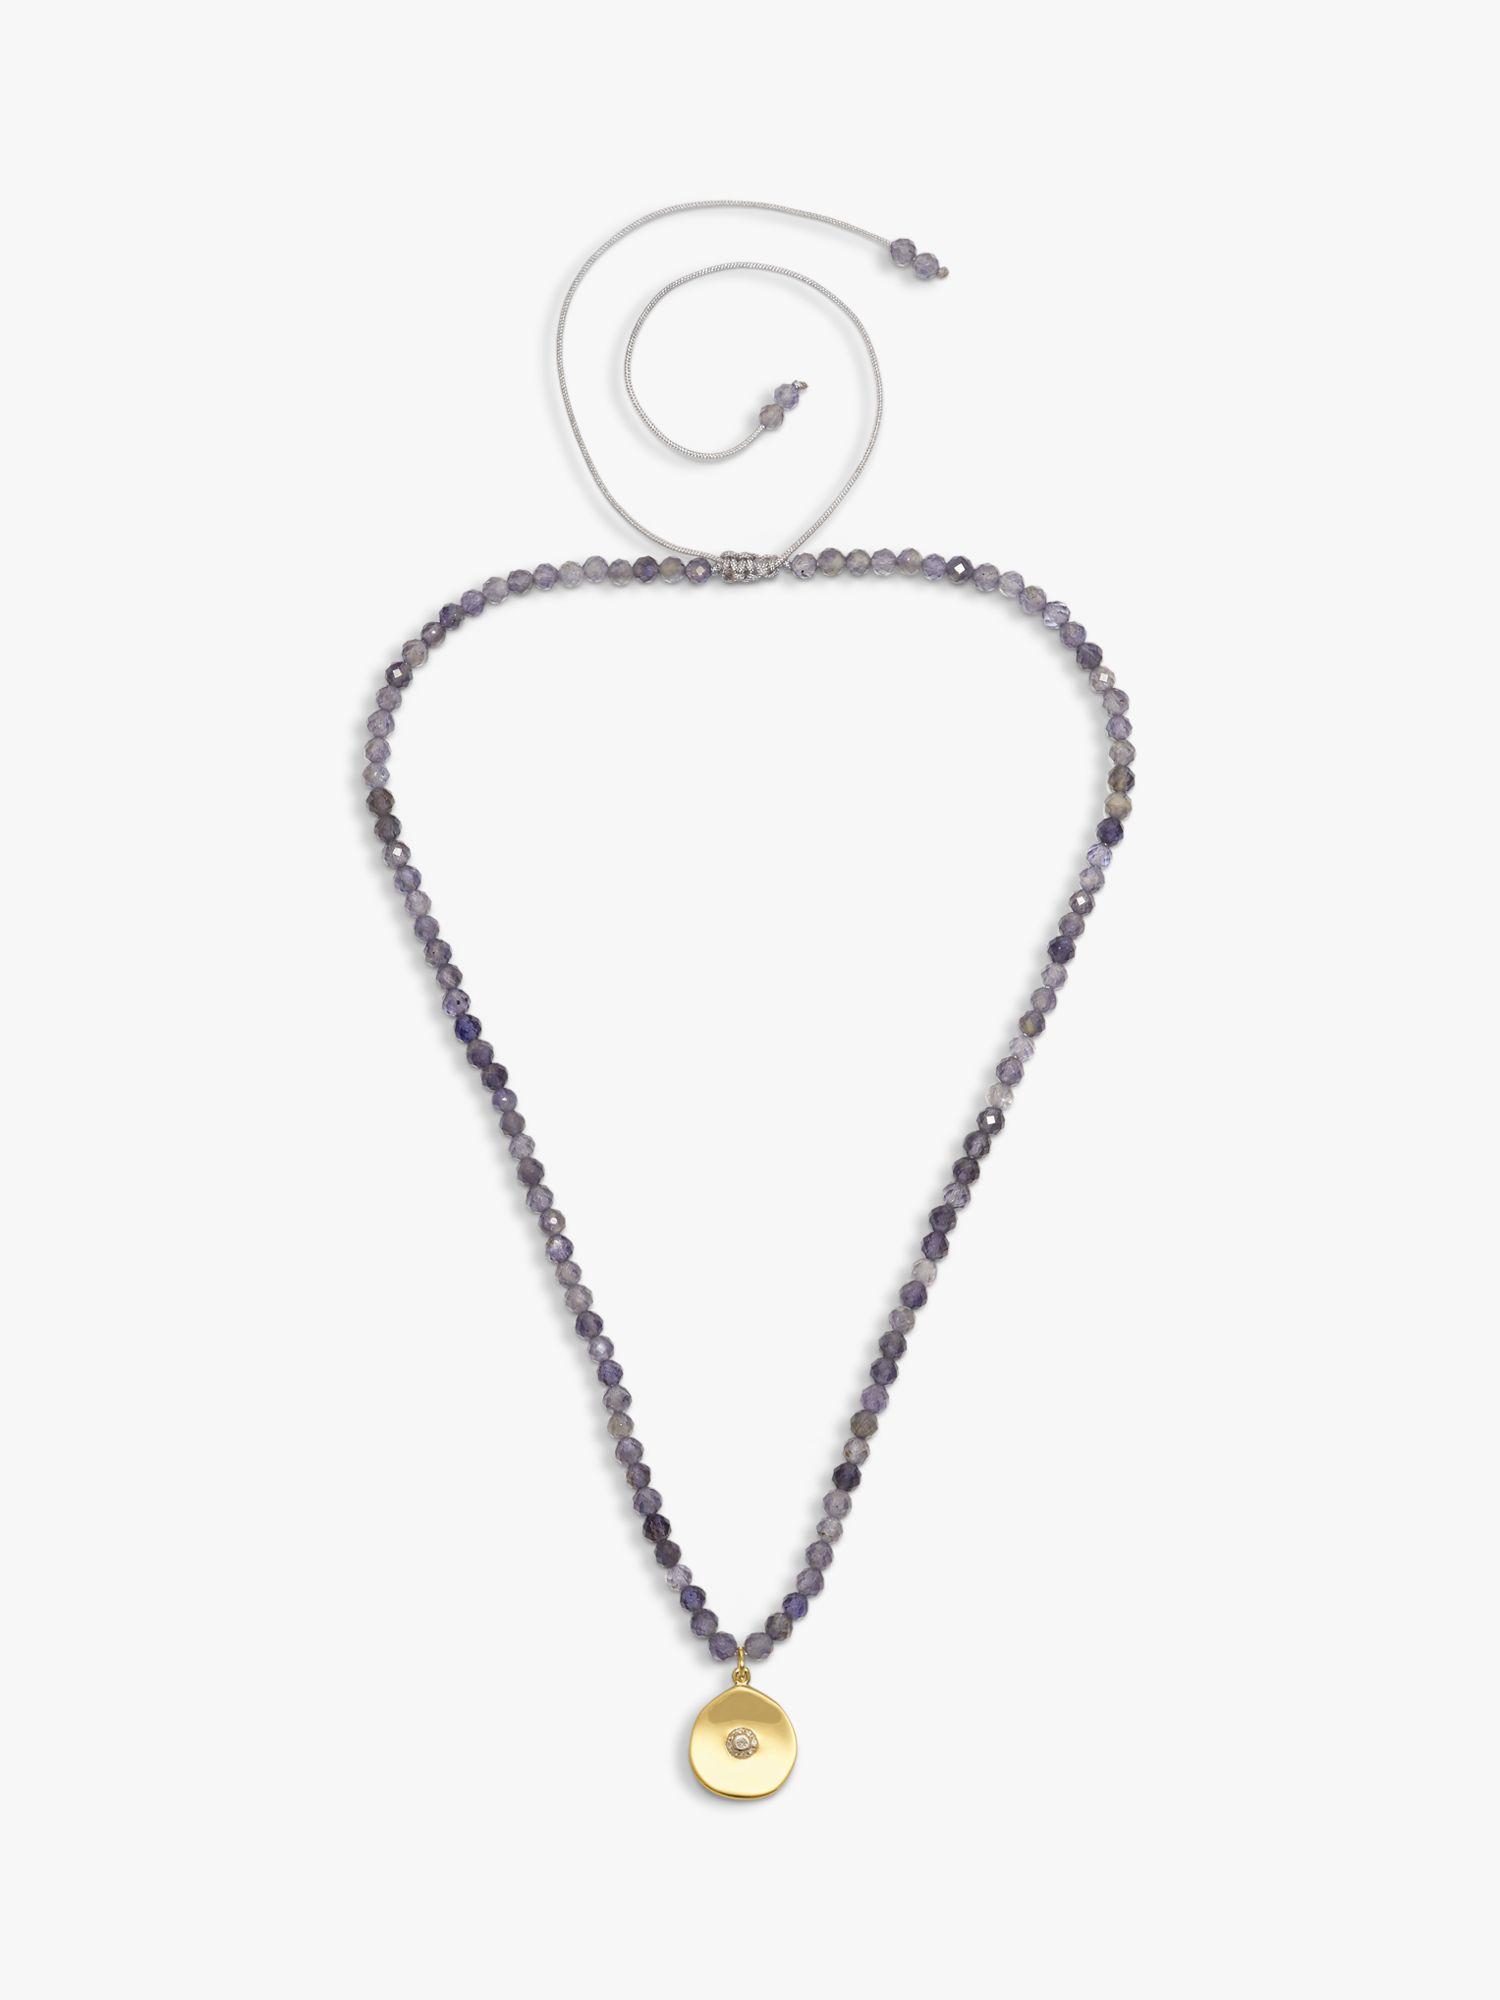 Lola Rose Lola Rose Curio Semi-Precious Bead Coin Pendant Necklace